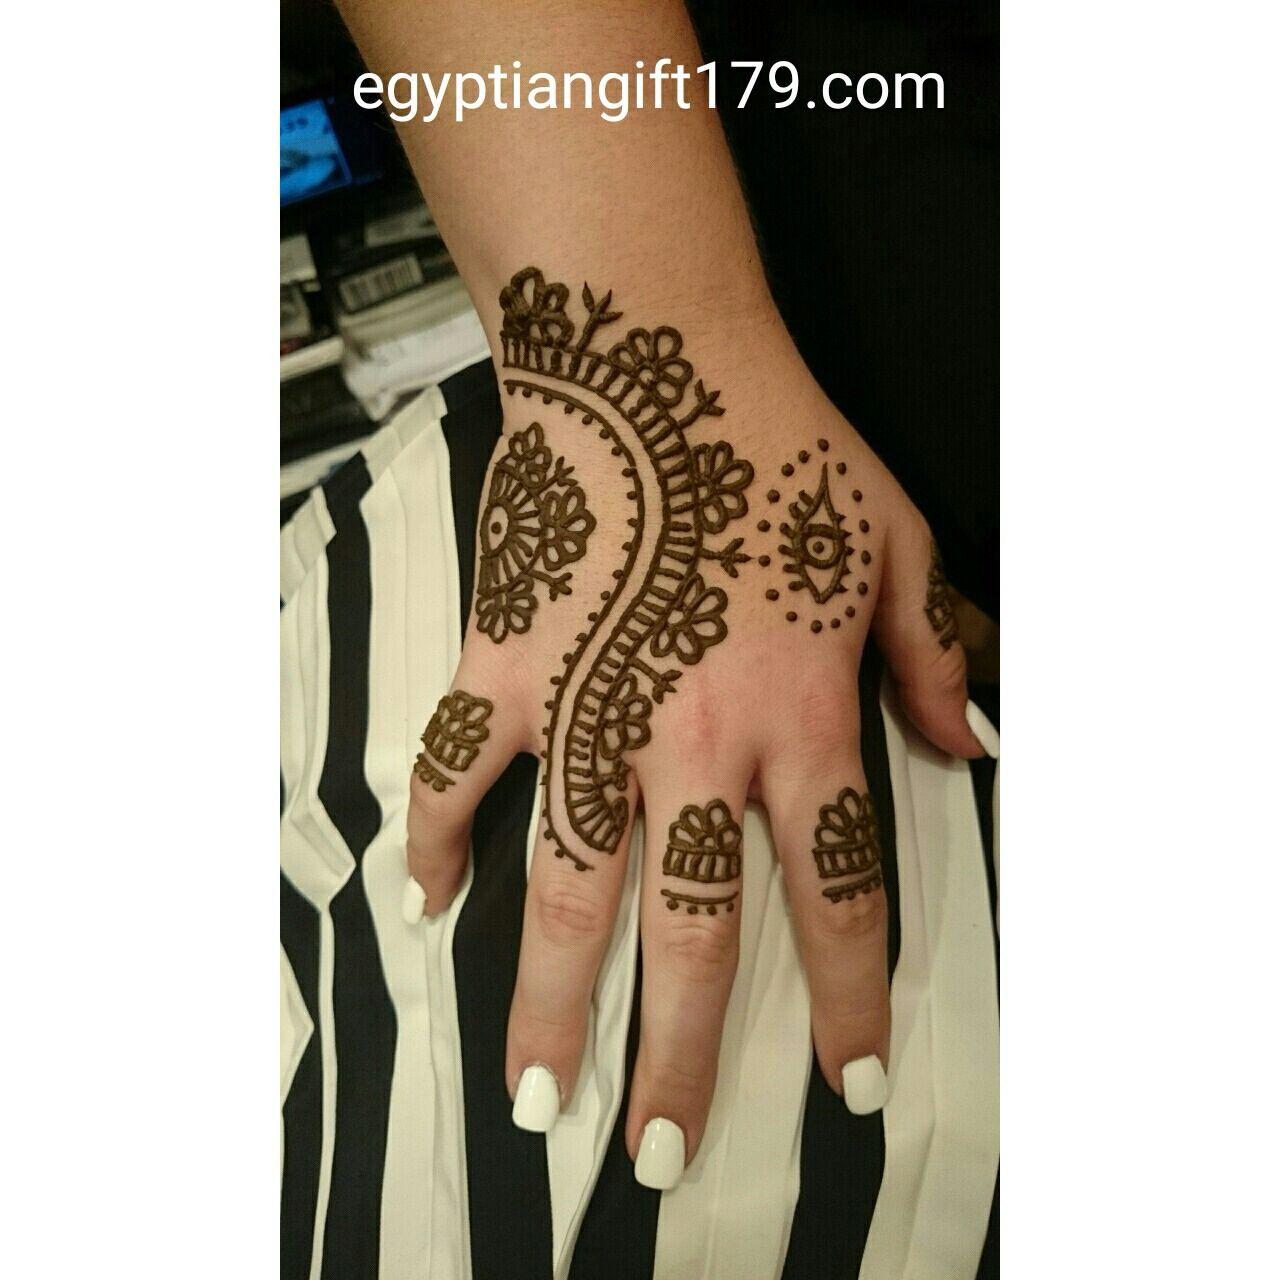 Egyptian Gift Corner Tattoo near me, Tattoos, Henna shop